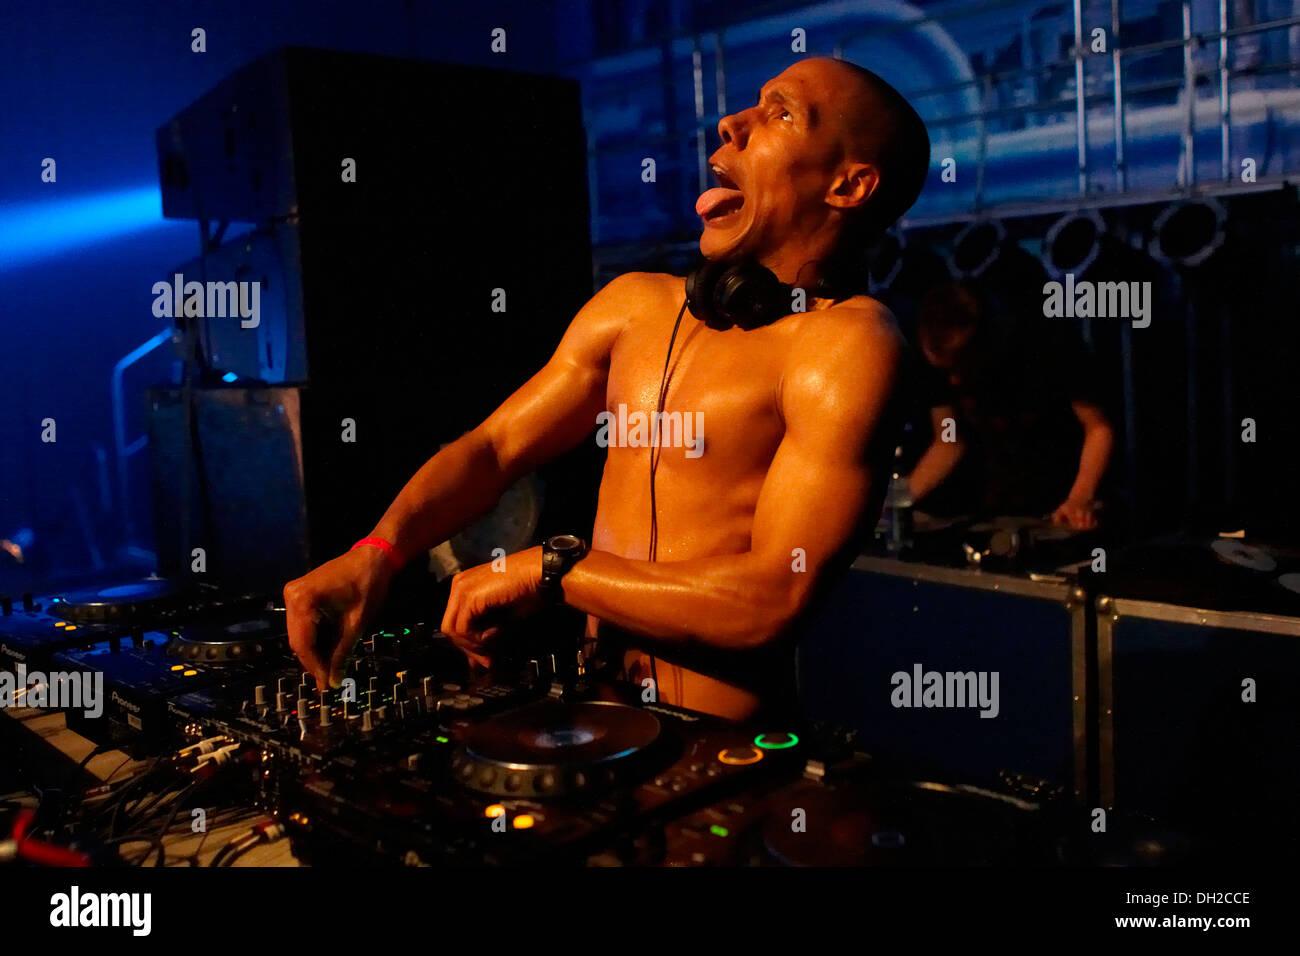 Showtek DJ, Techno-Festival Mayday 2010 in der Westfalenhalle Concert Hall, Dortmund, Nordrhein-Westfalen Stockbild